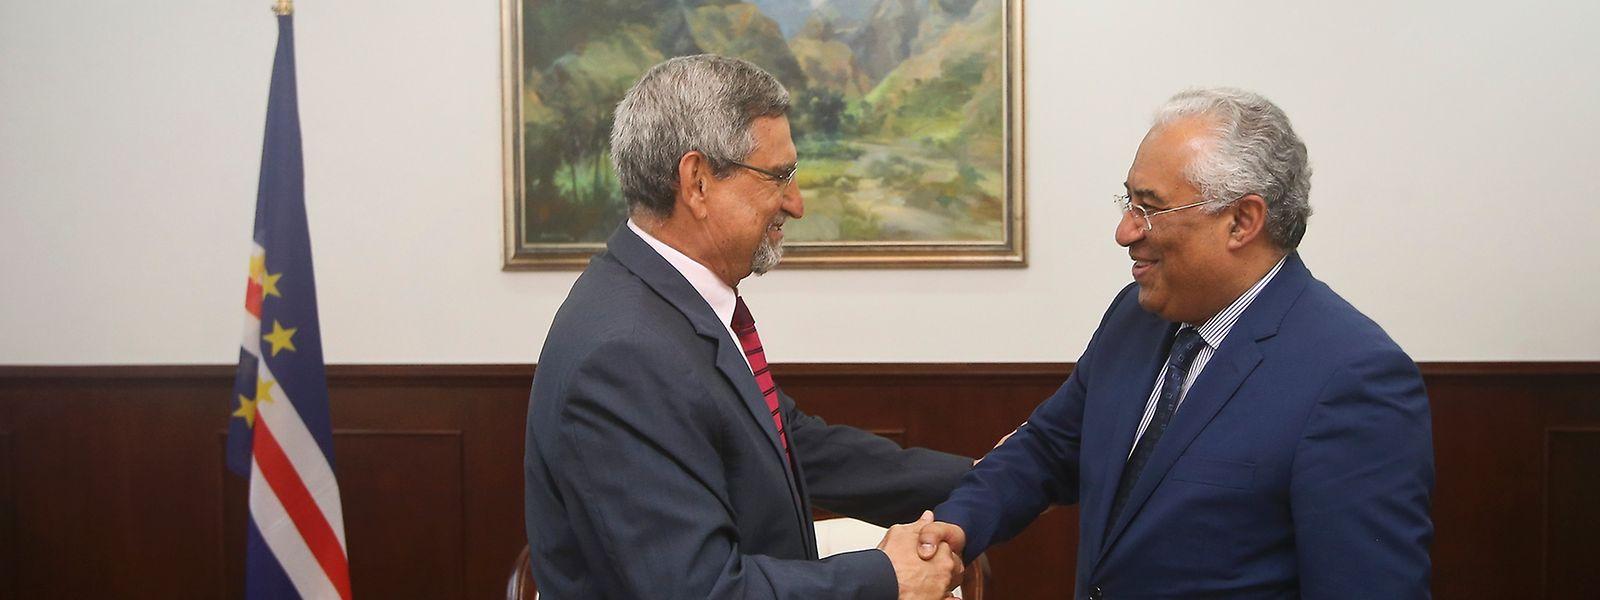 António Costa cumprimenta o Presidente da República de Cabo Verde, Jorge Carlos Fonseca